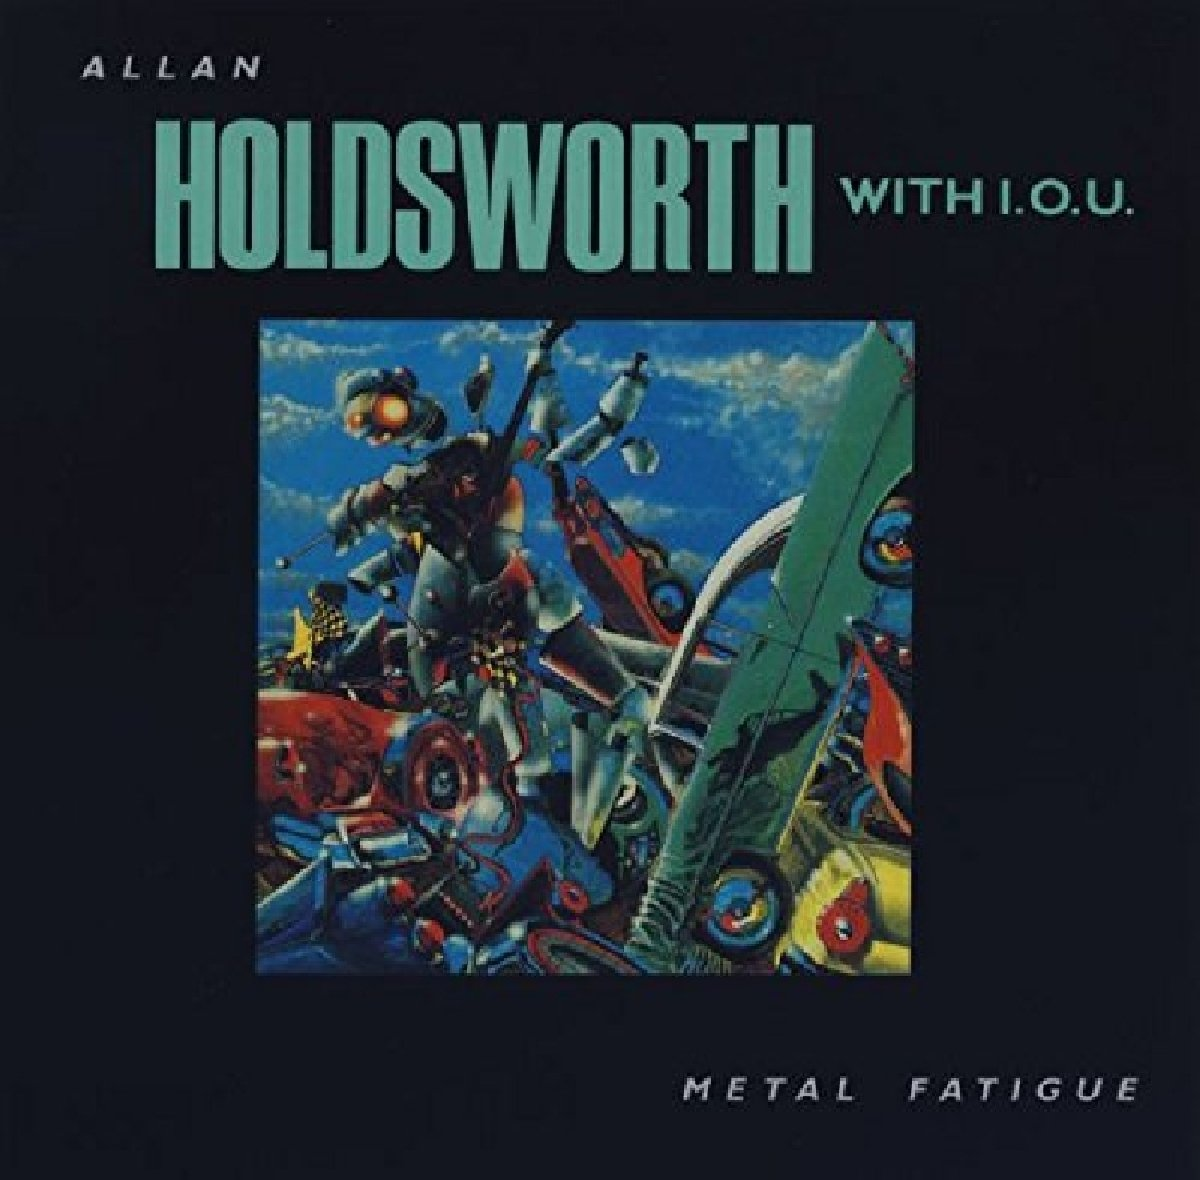 Allan Holdsworth - Metal Fatigue (CD)